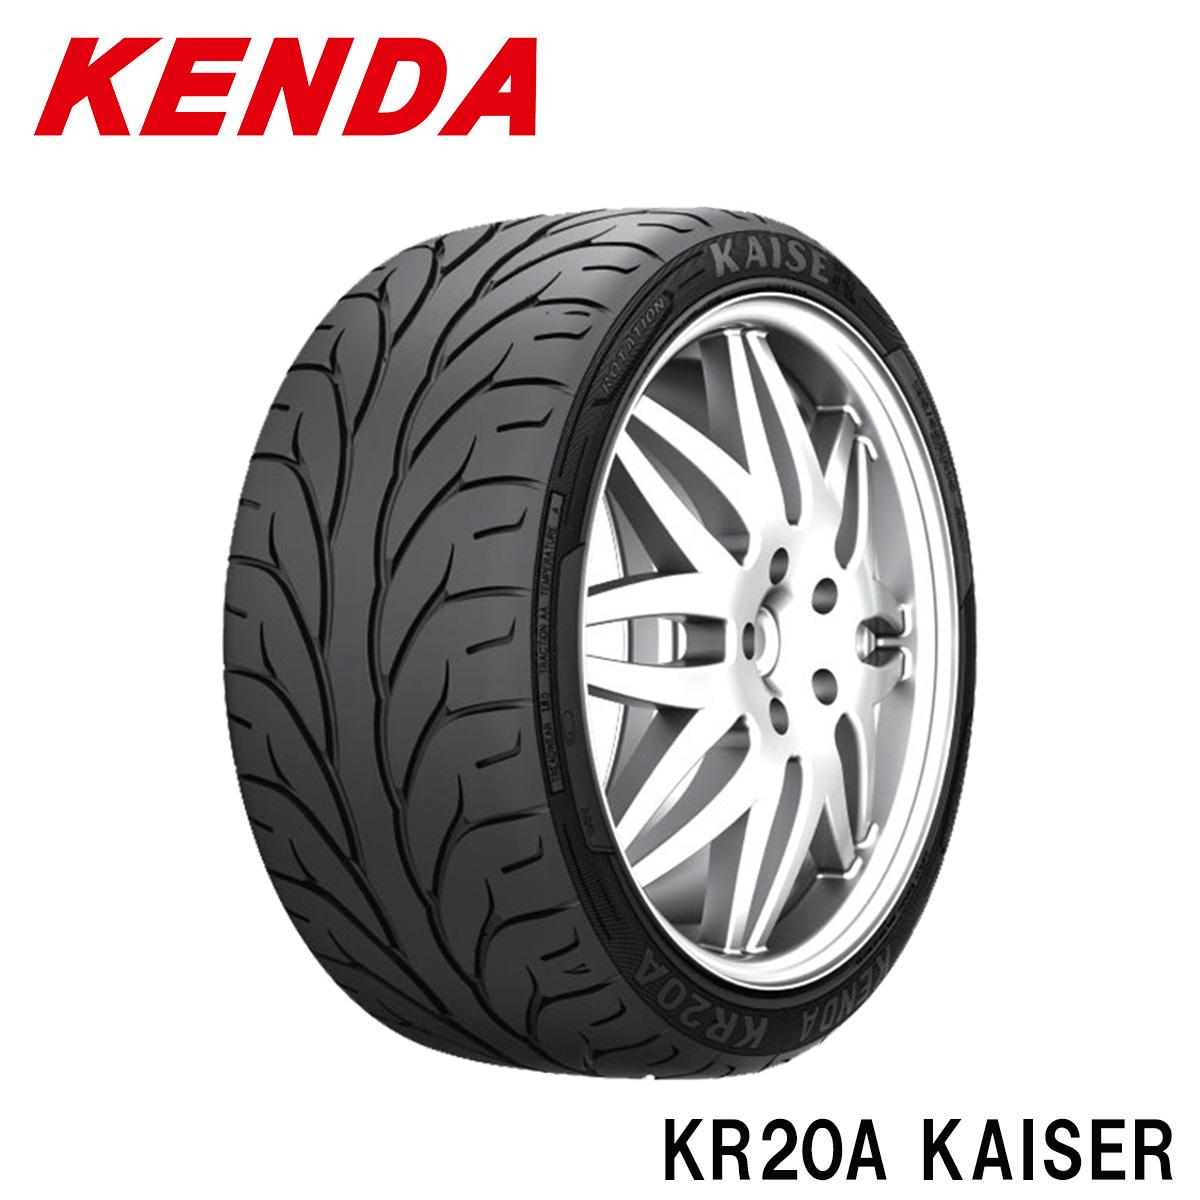 KENDA ケンダ サマータイヤ 4本 セット 17インチ 235/40R17 カイザー KAISER KR20A